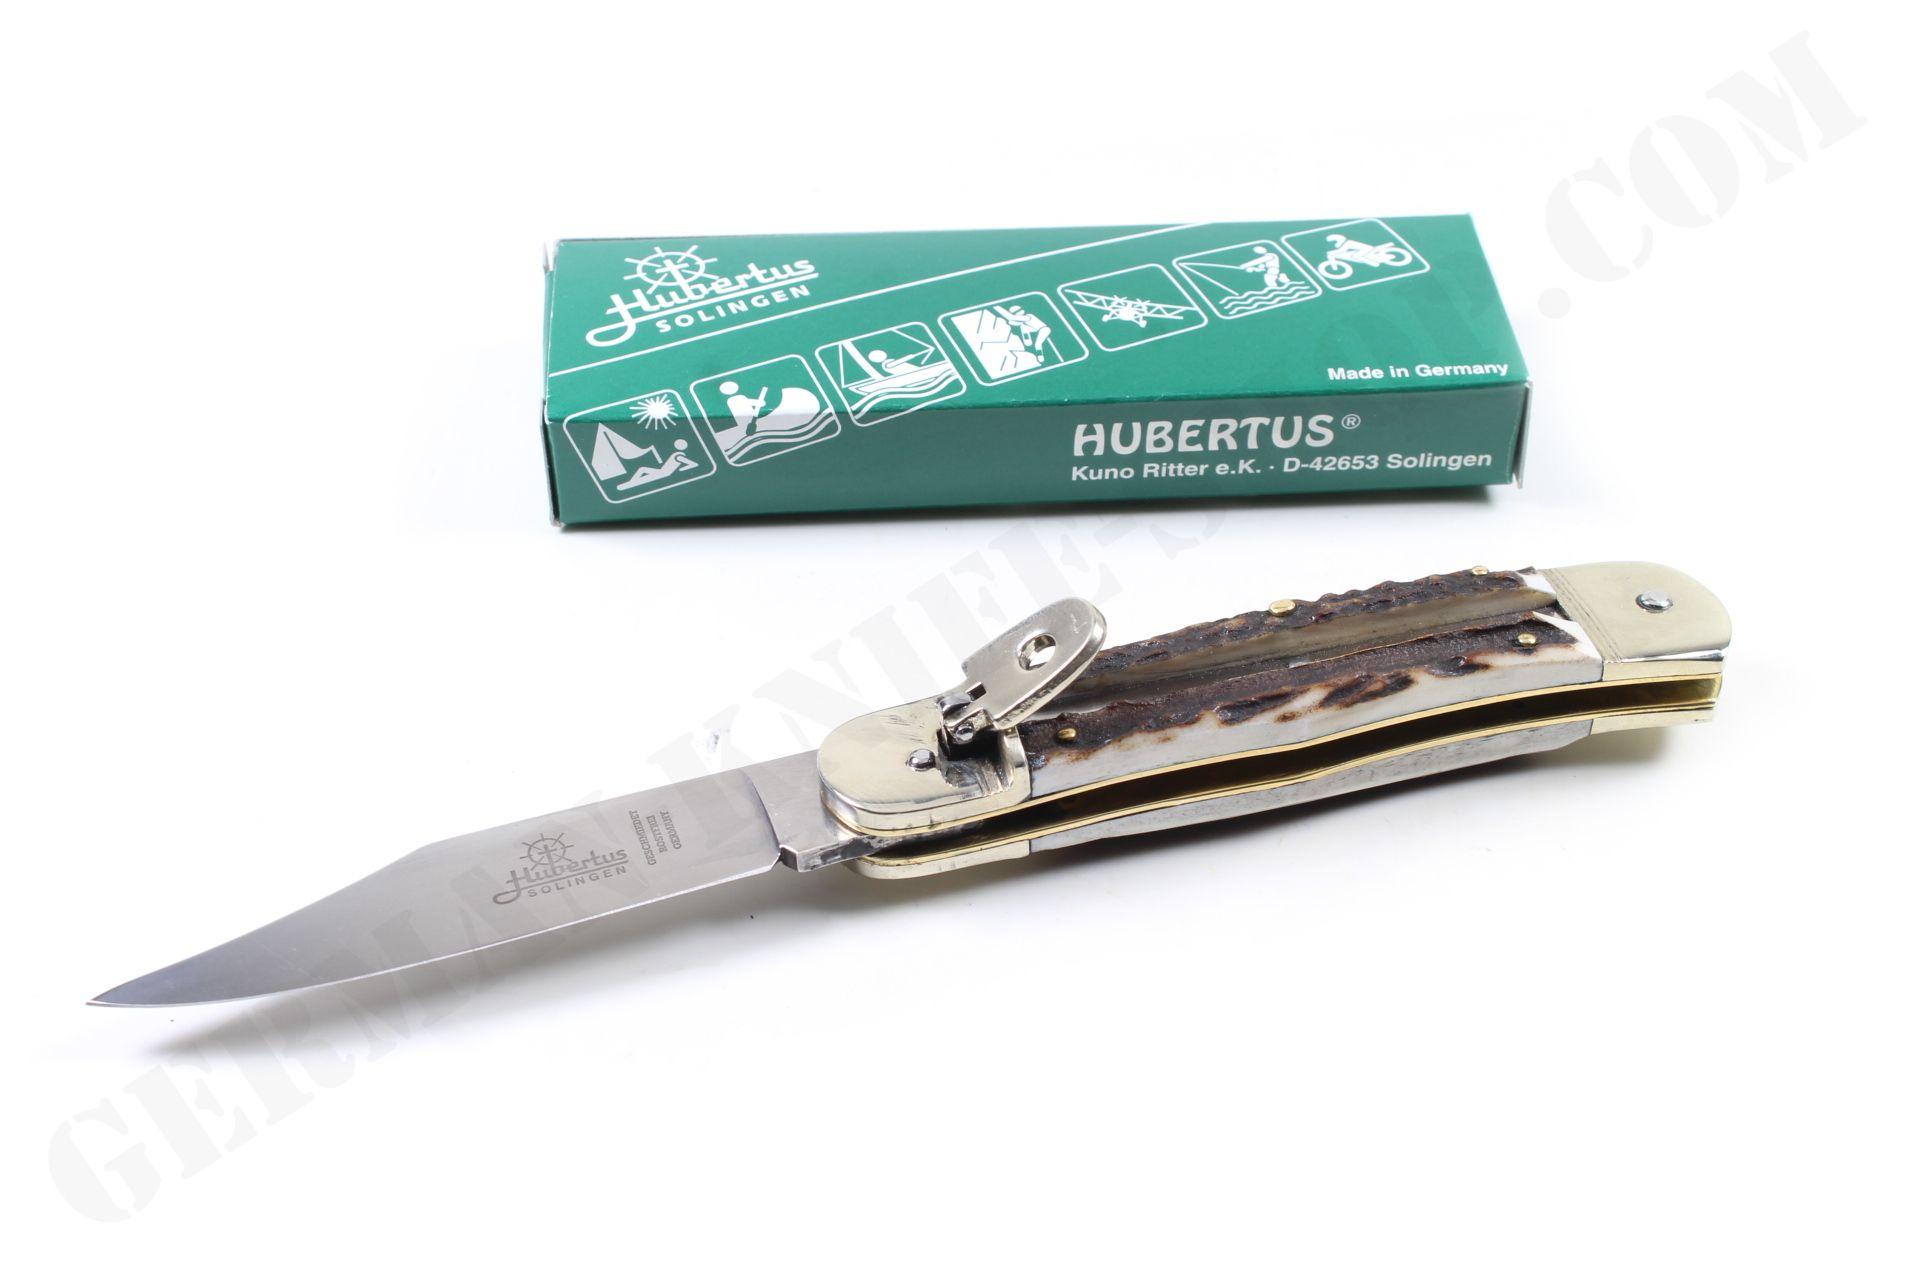 Hubertus Special Pocket Knife Large Buckhorn | Mossy oak